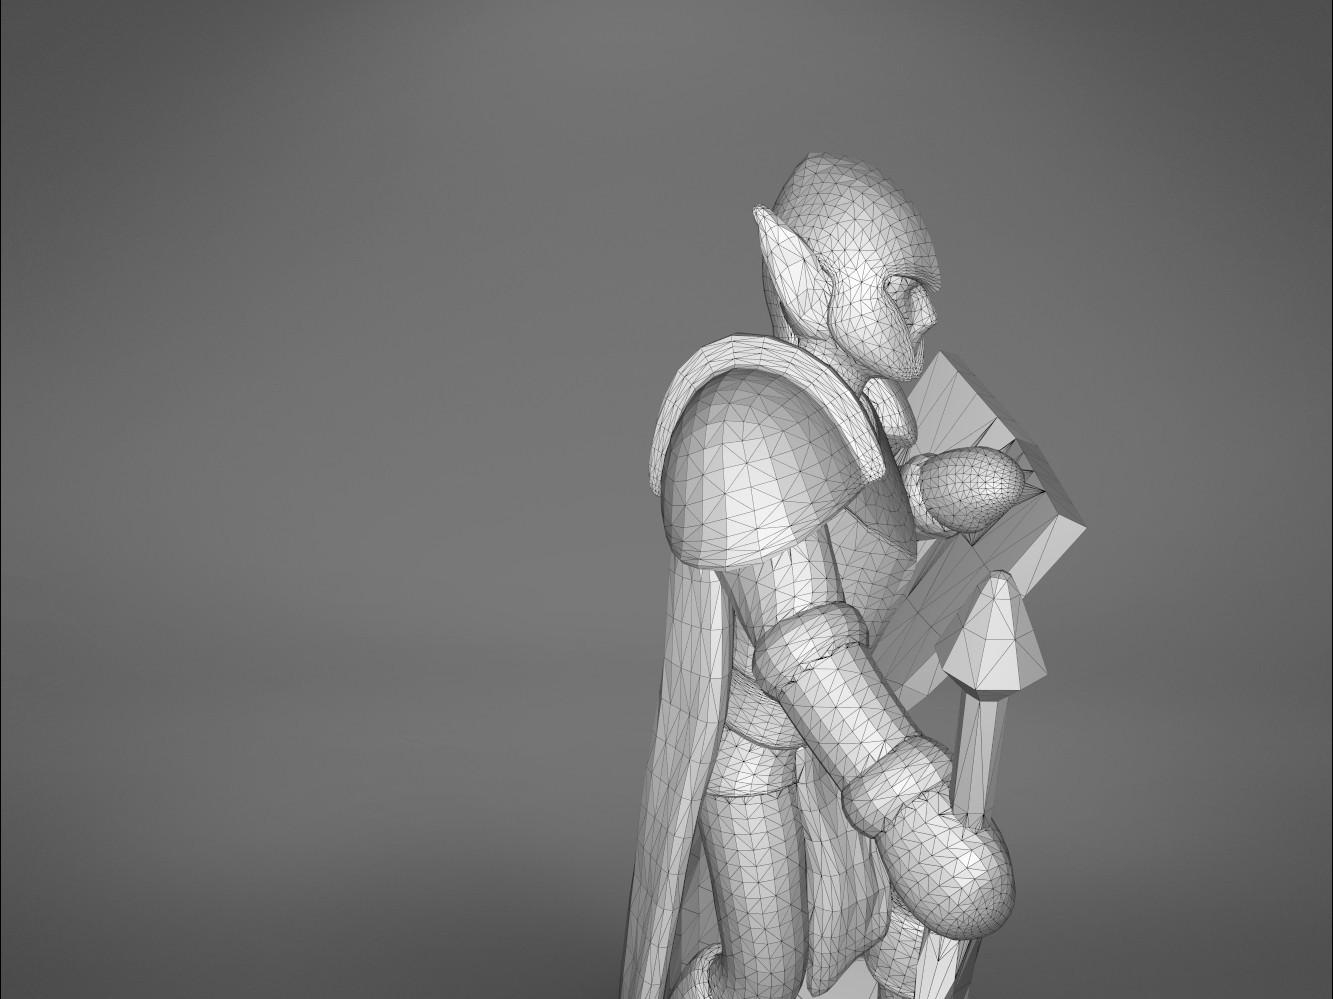 Warrior-detail_1.381.jpg Download STL file ELF WARRIOR CHARACTER GAME FIGURE 3D print model • Object to 3D print, 3D-mon